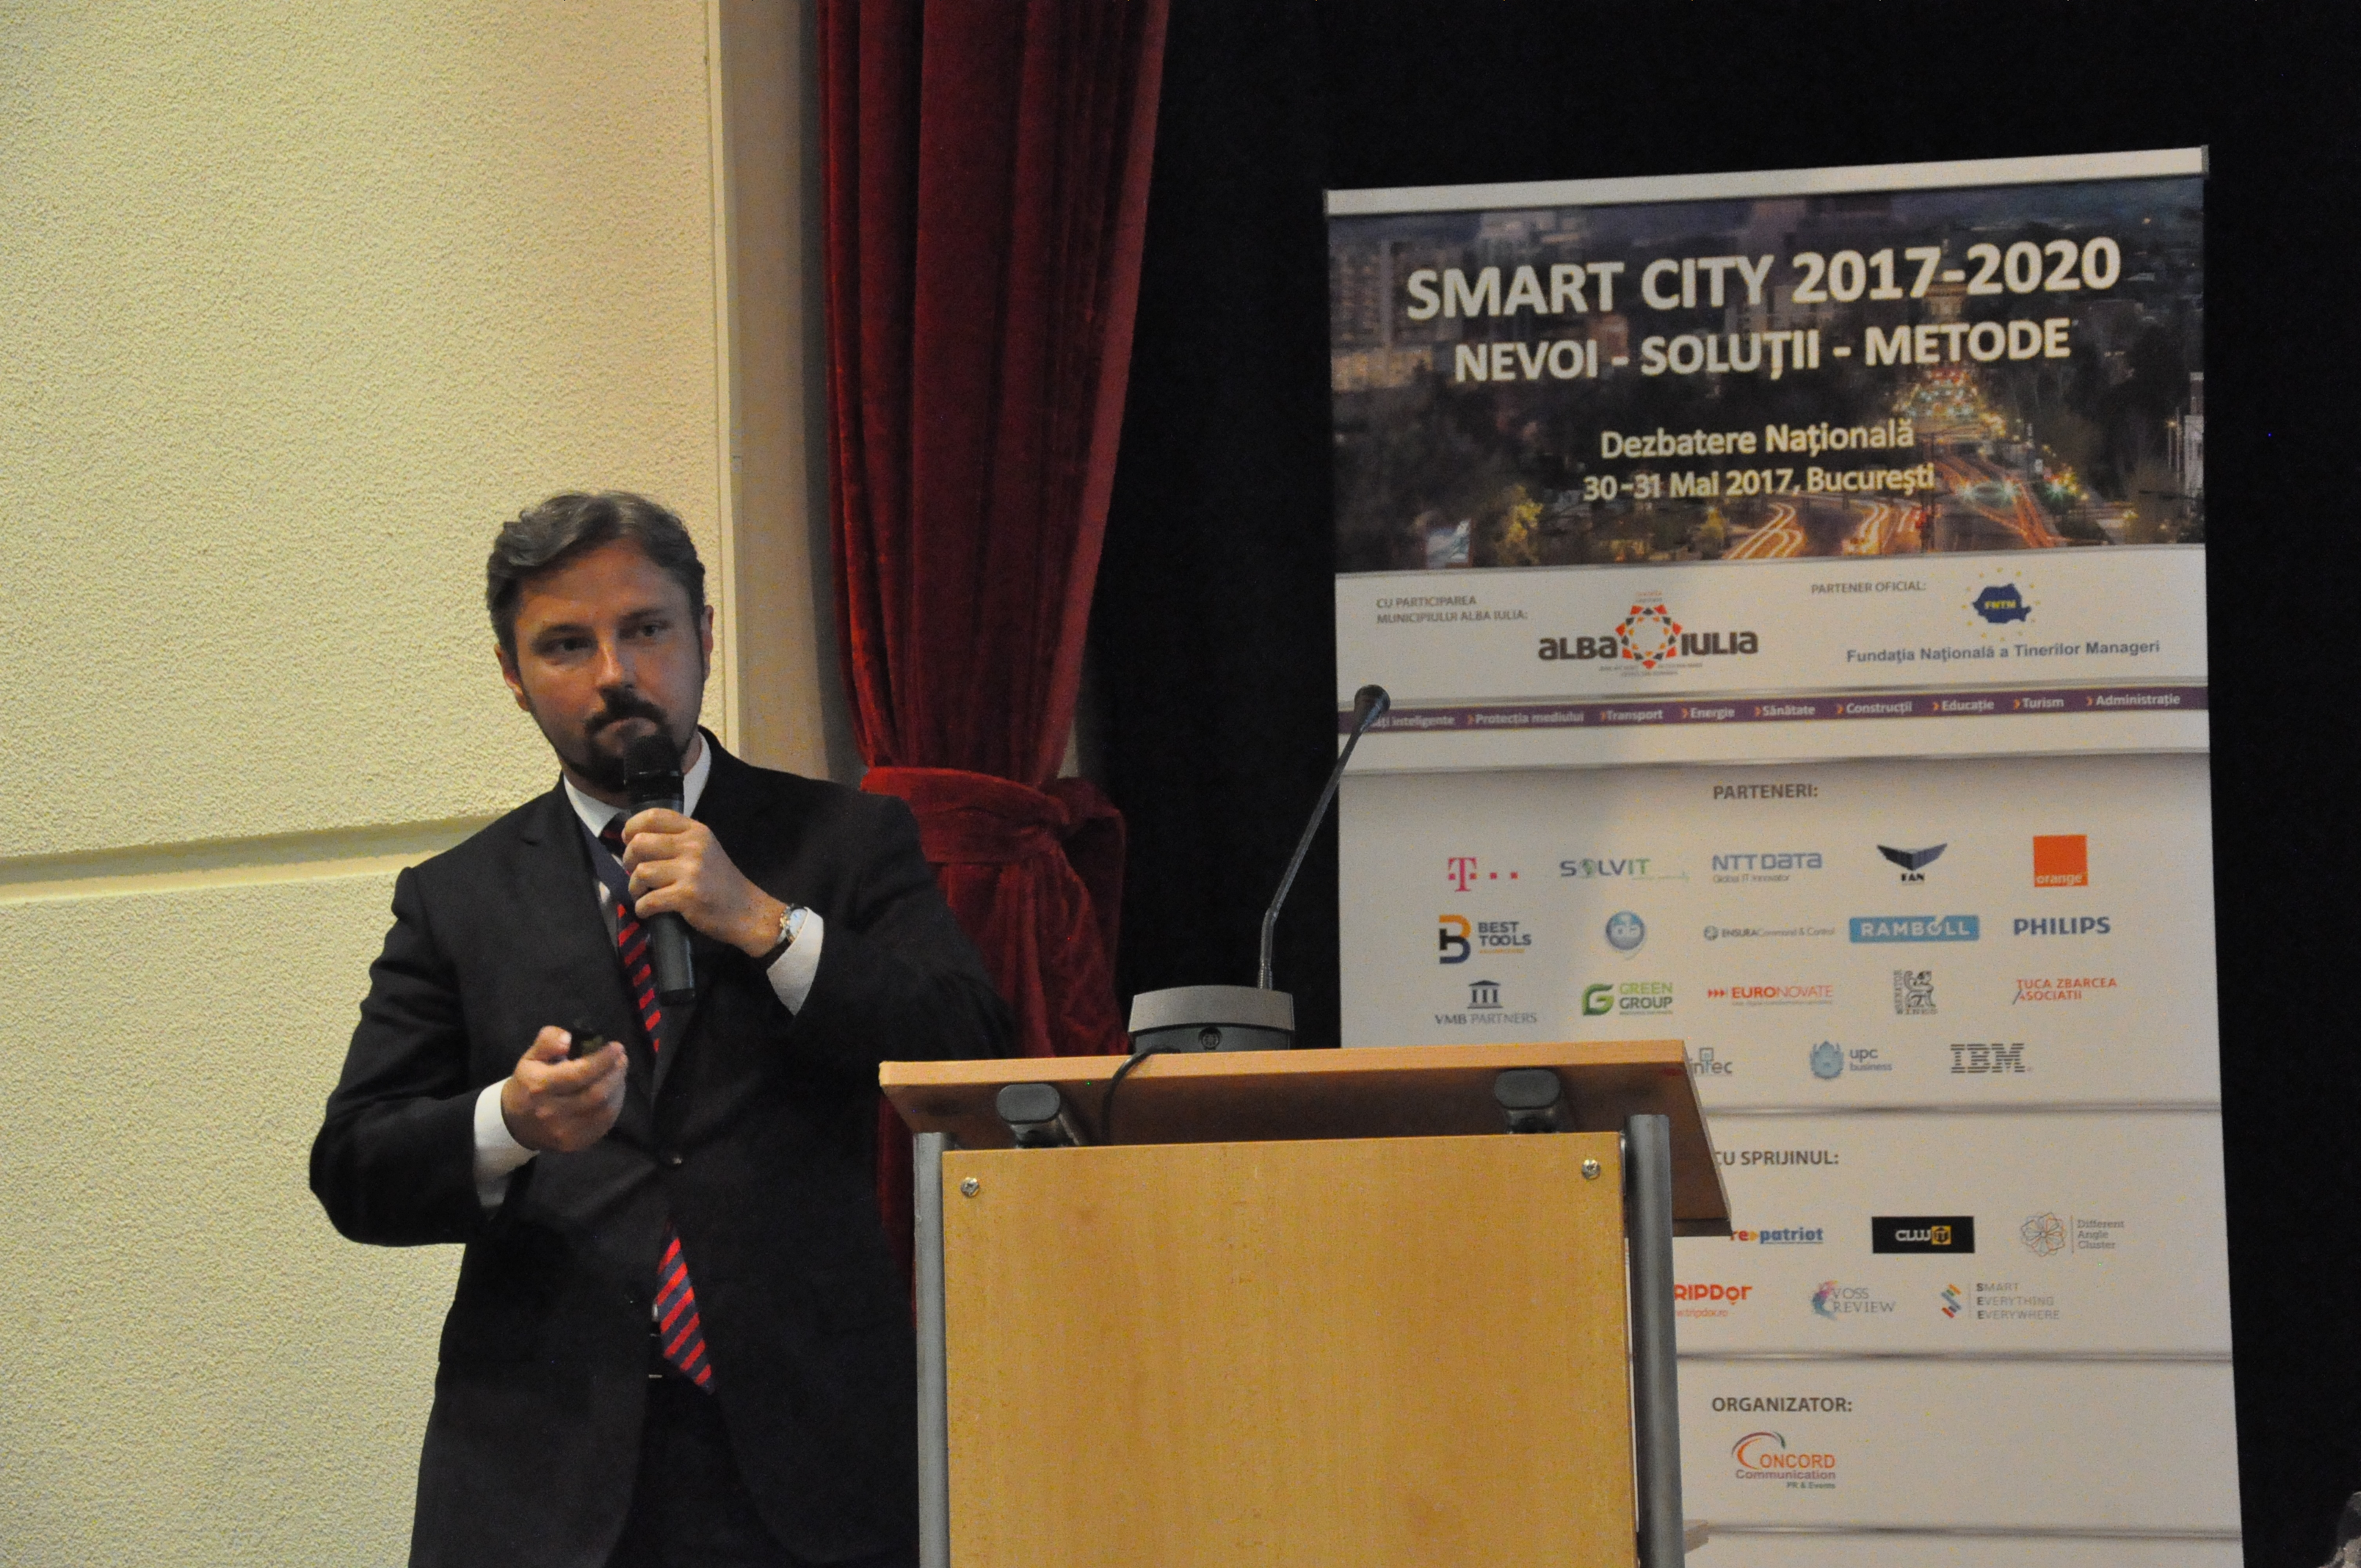 smartcity79